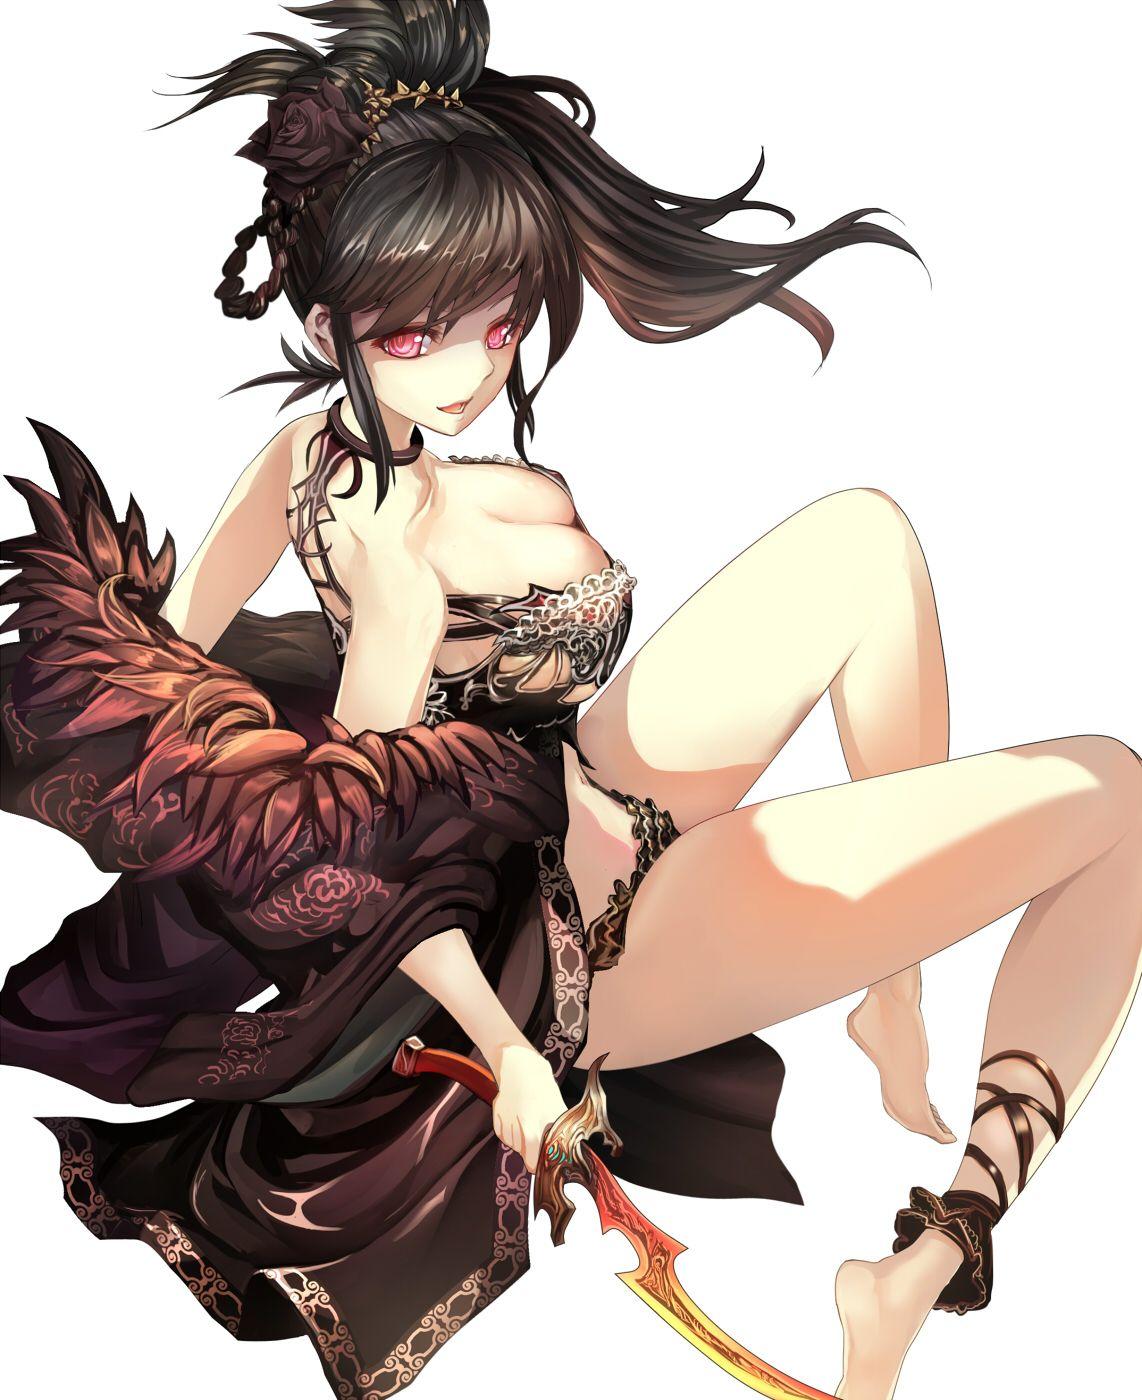 Aside! Anime bare breast seems